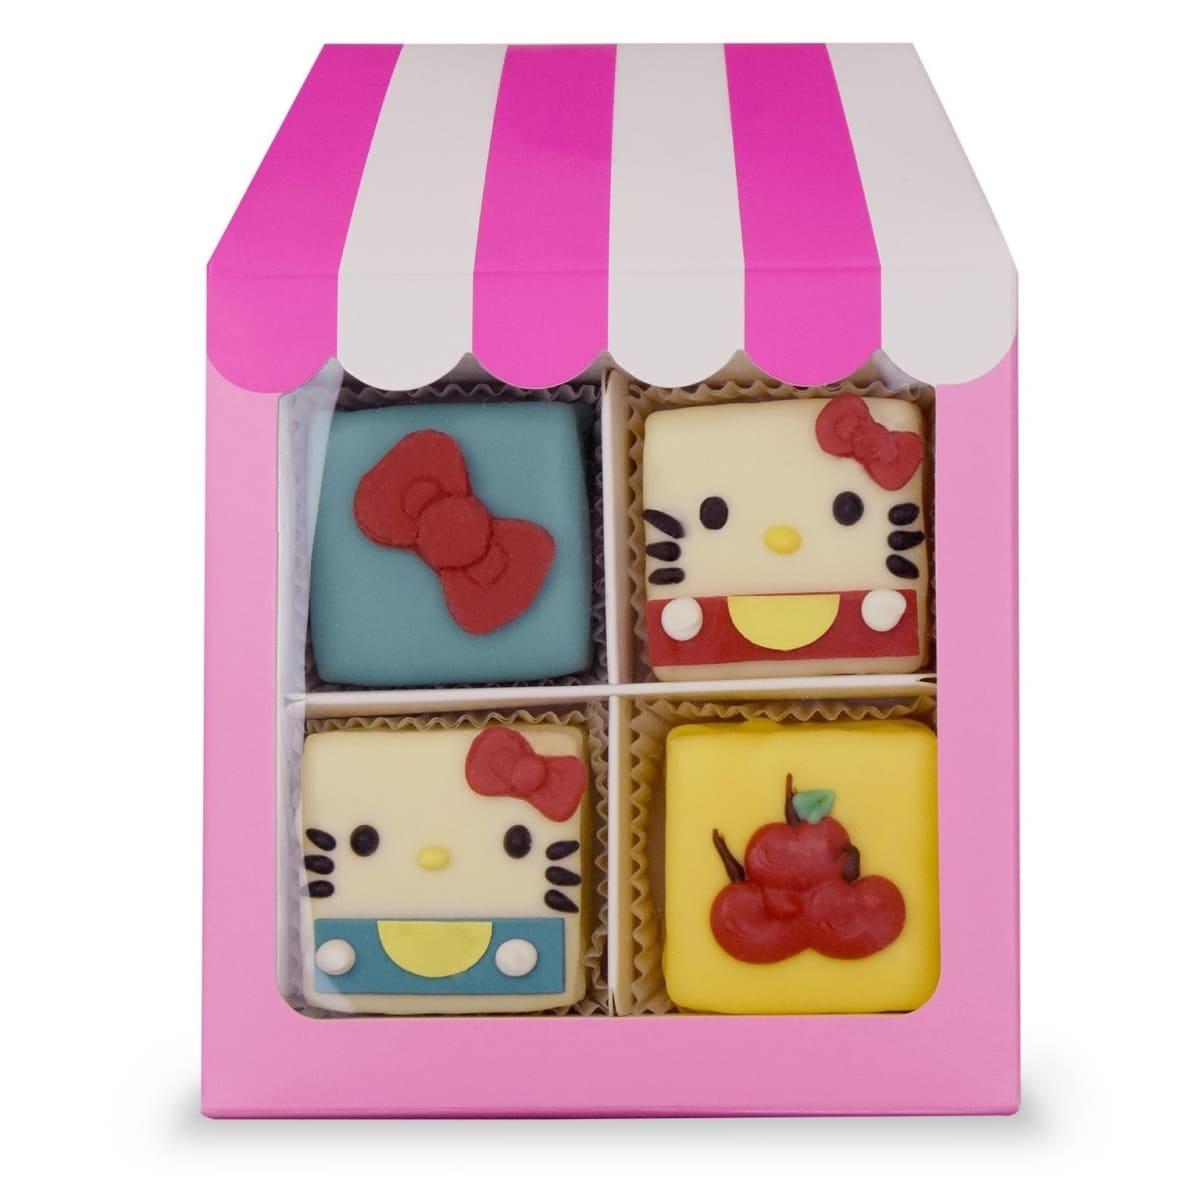 Hello Kitty Cafe truck mini cakes